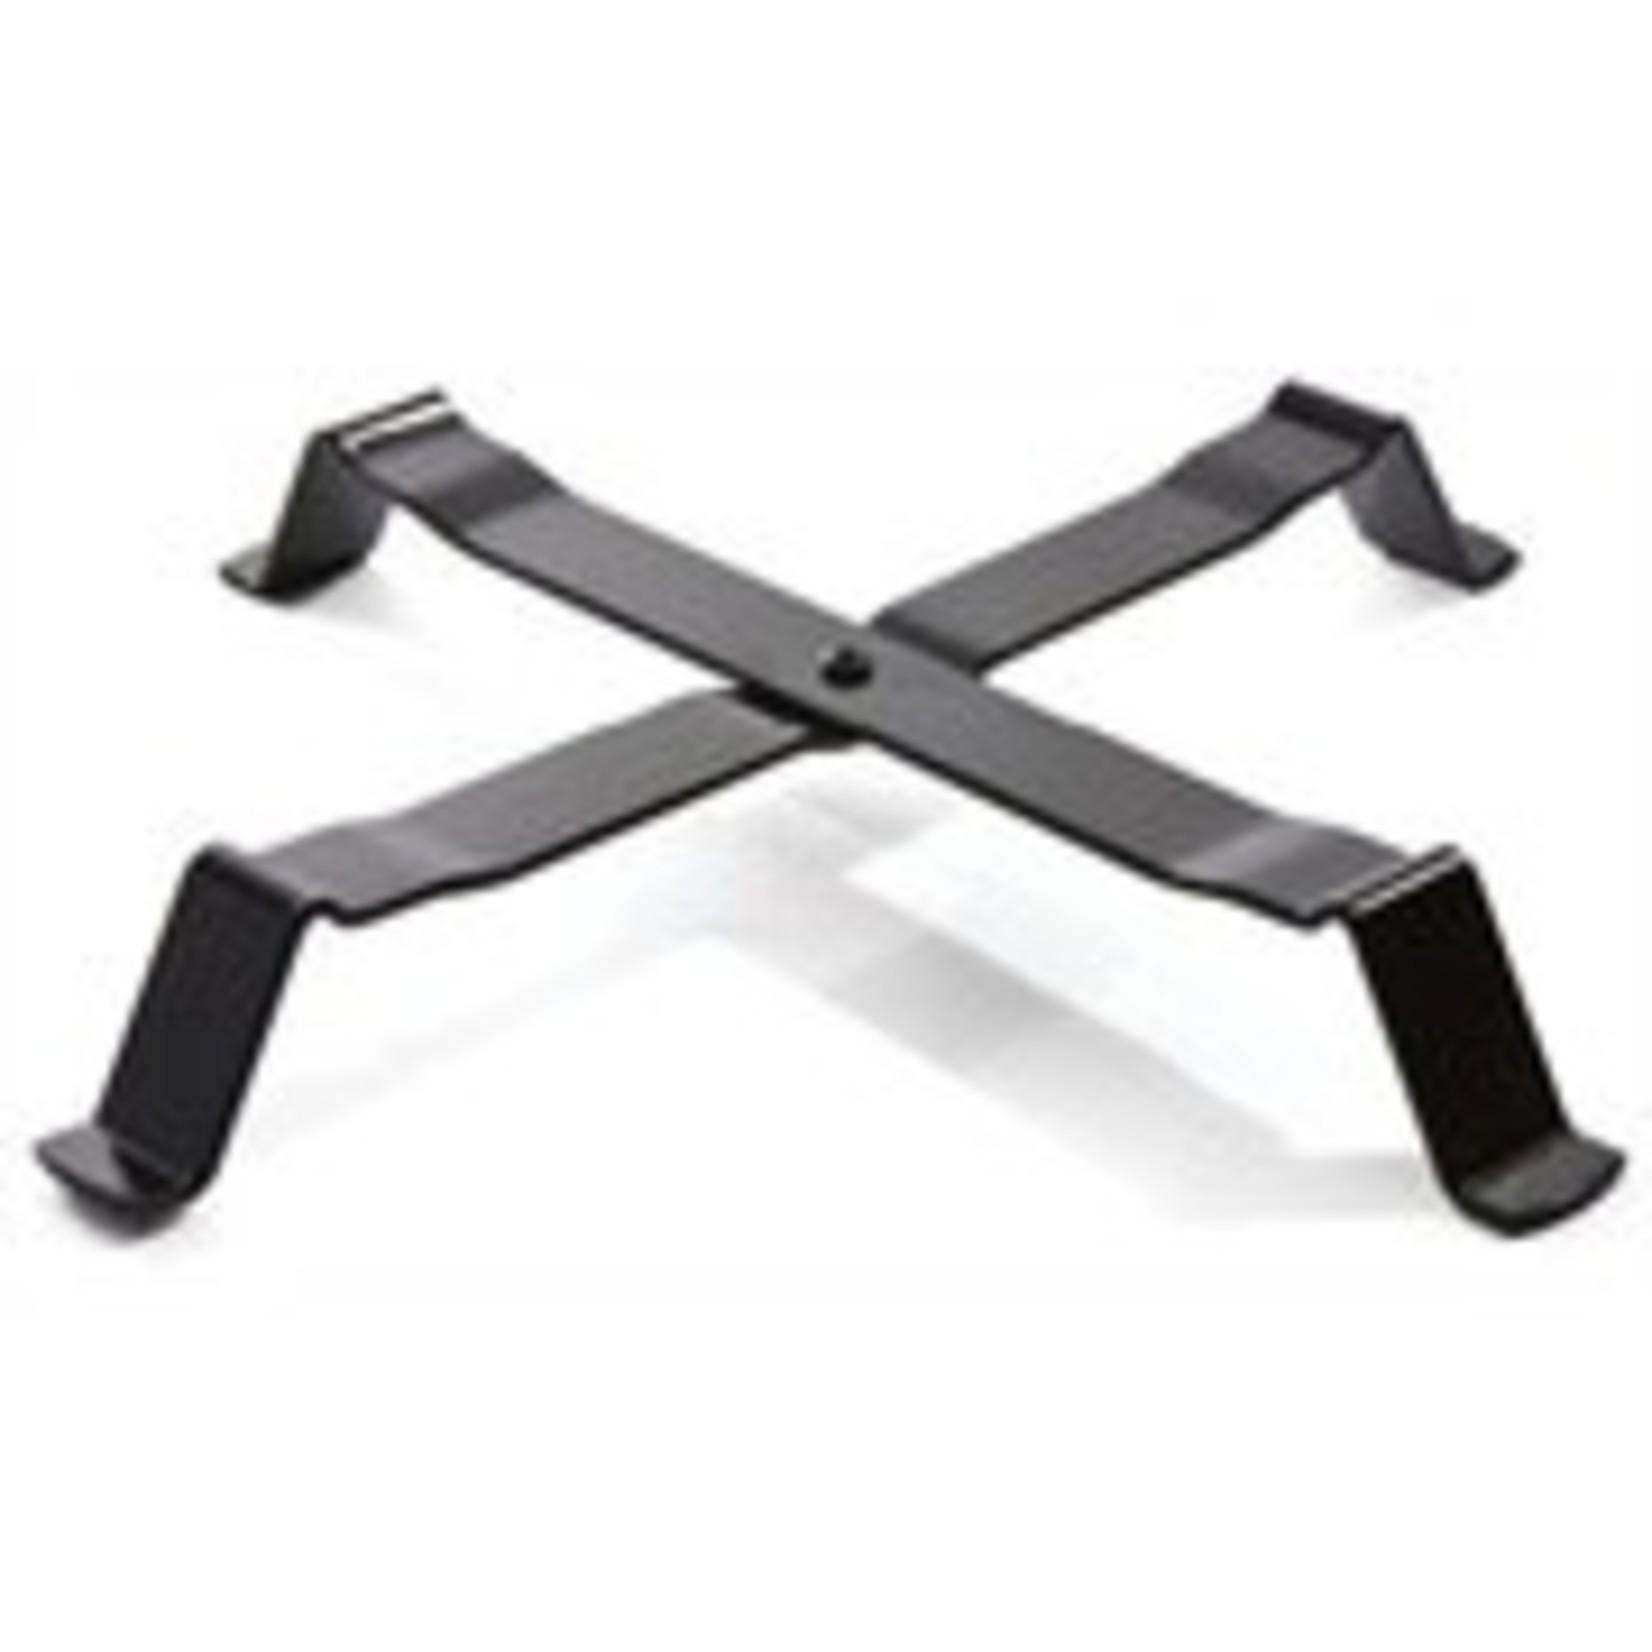 The Bastard The Bastard Table Stand